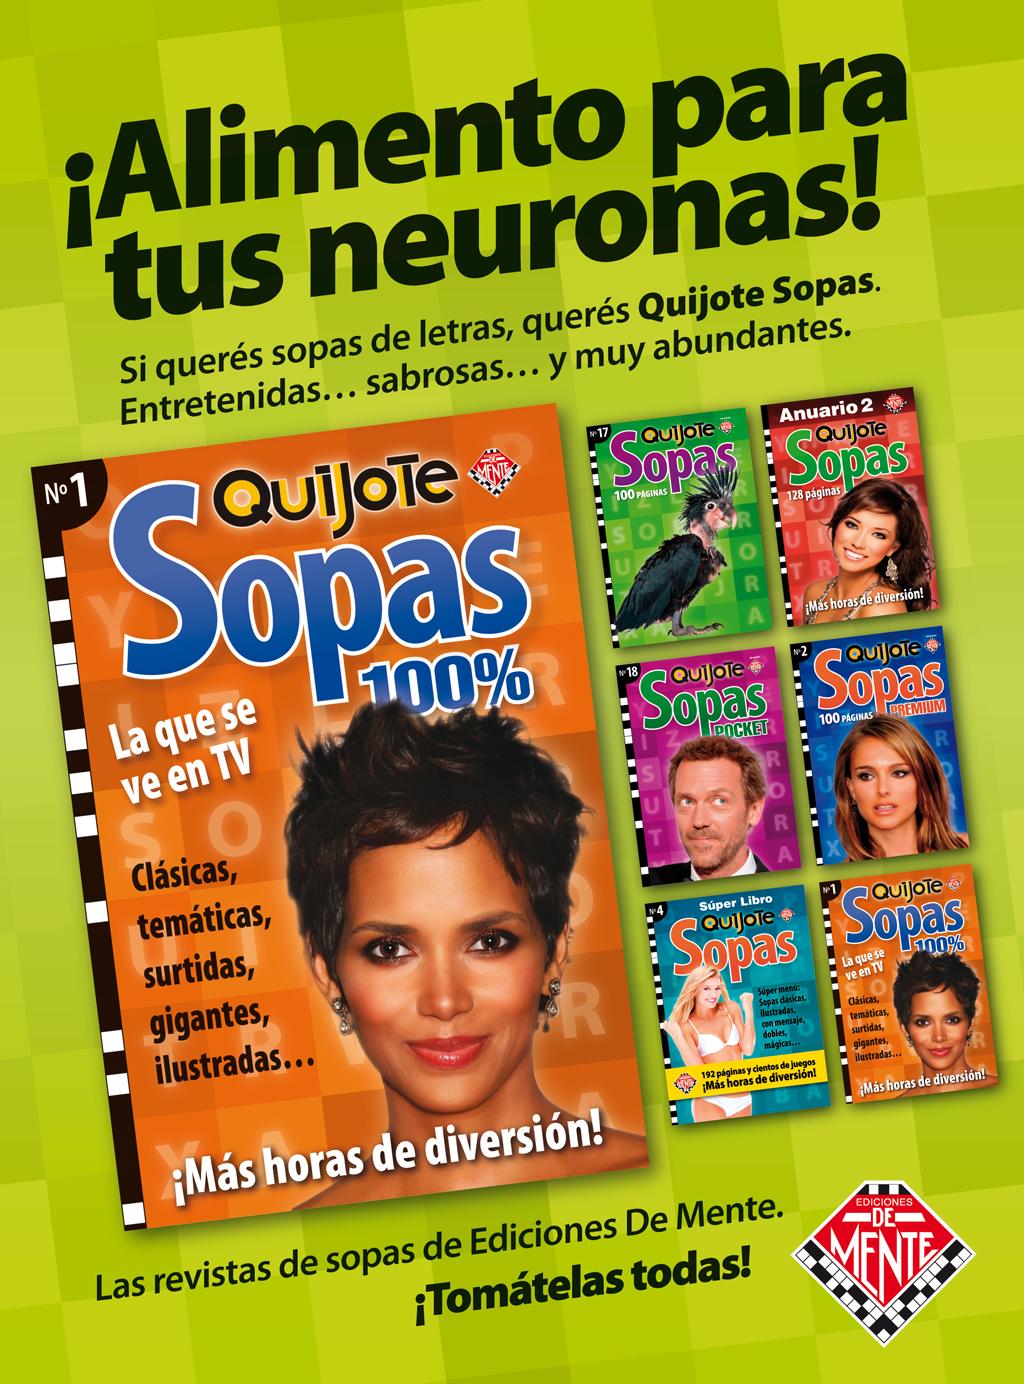 Afiche Quijote Sopas para kioscos.